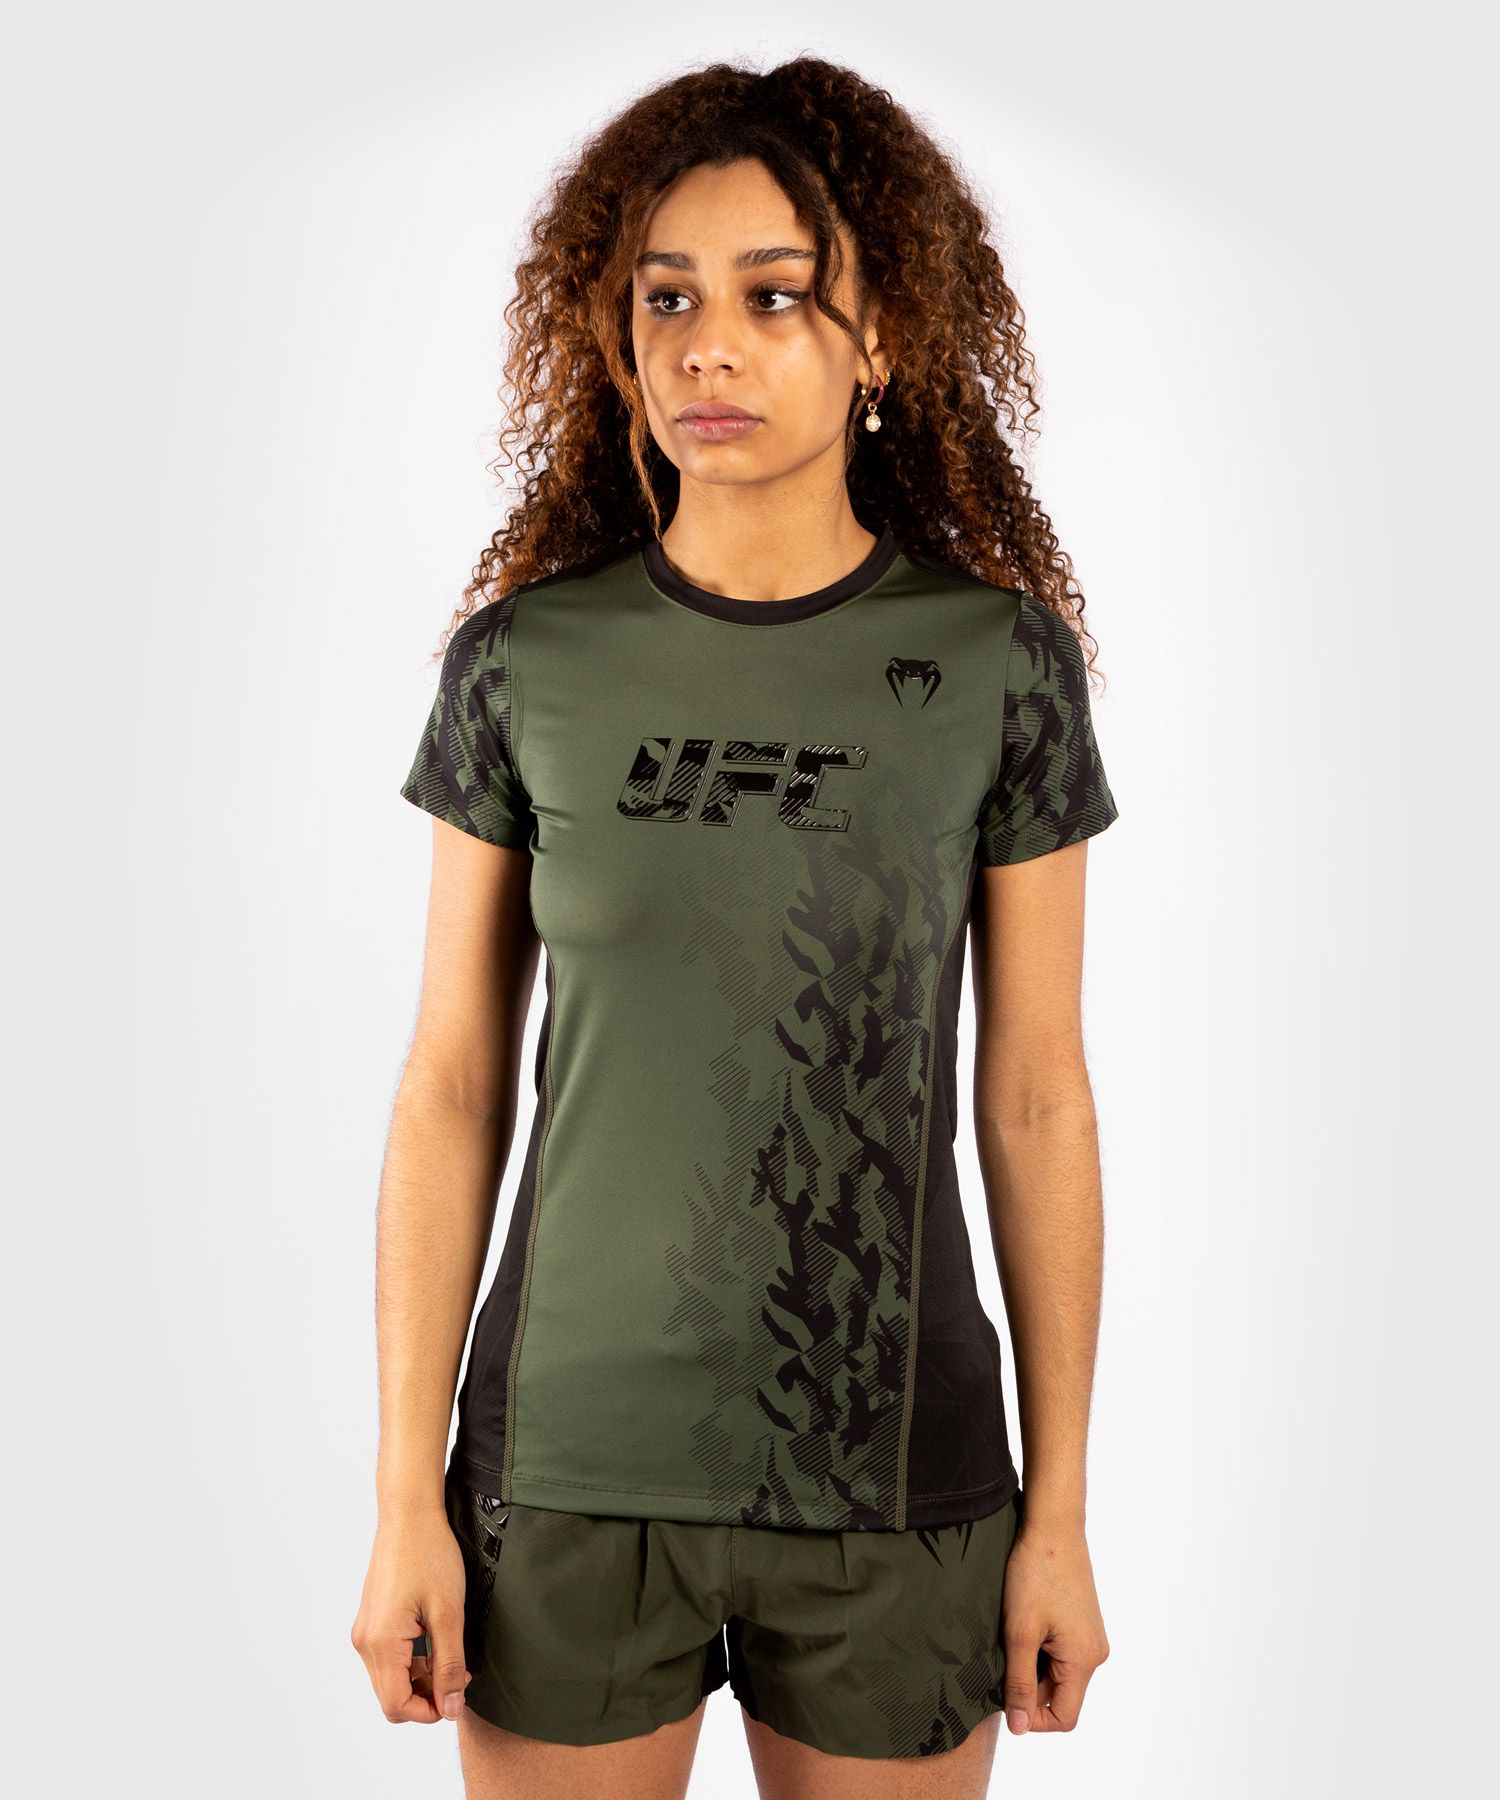 ЖЕНСКАЯ ФУТБОЛКА UFC VENUM FIGHT WEEK  PERFORMANCE - Хаки